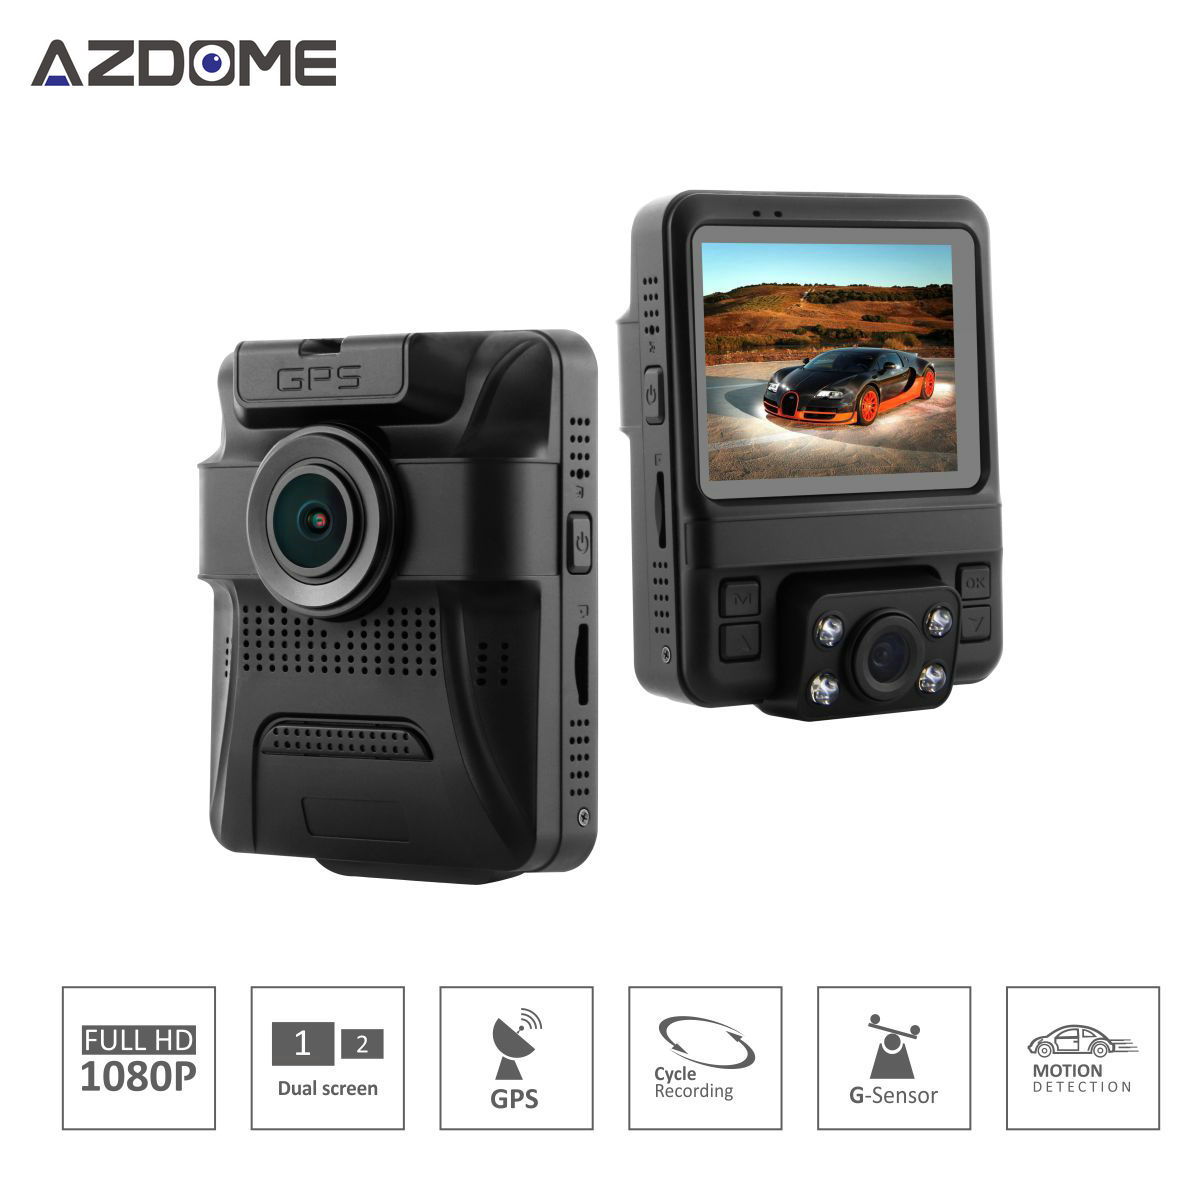 Azdome GS65H Mini Dual Lens Car DVR Camera 1080P Full HD Dash Cam Novatek 96655 Video Recorder Built-in GPS Night Vision H49(China (Mainland))